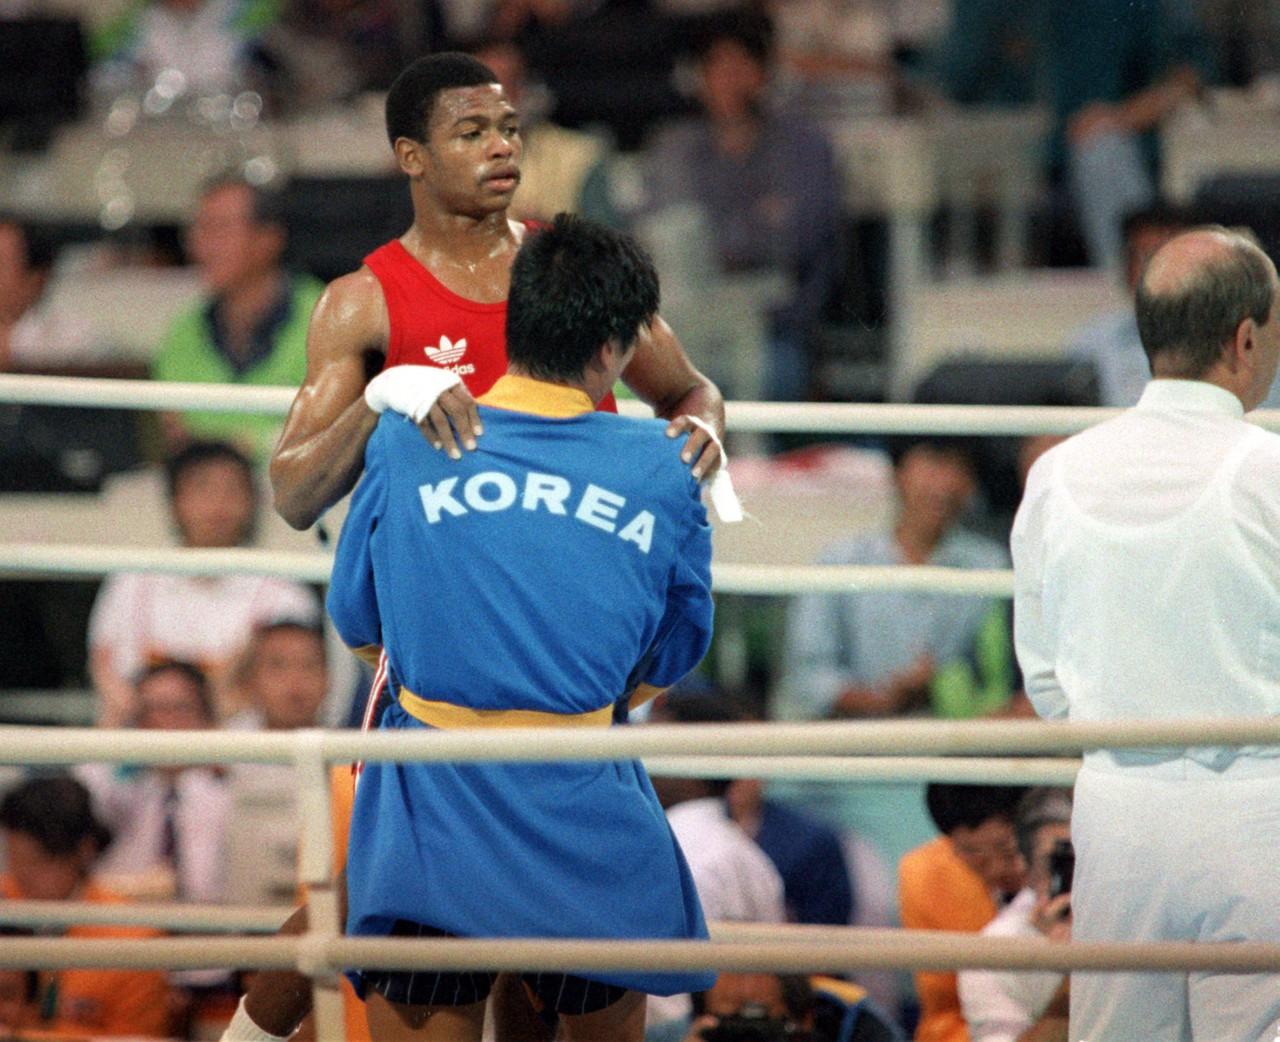 Roy Jones Jr. durante as Olimpíadas de 1988 - Getty Images